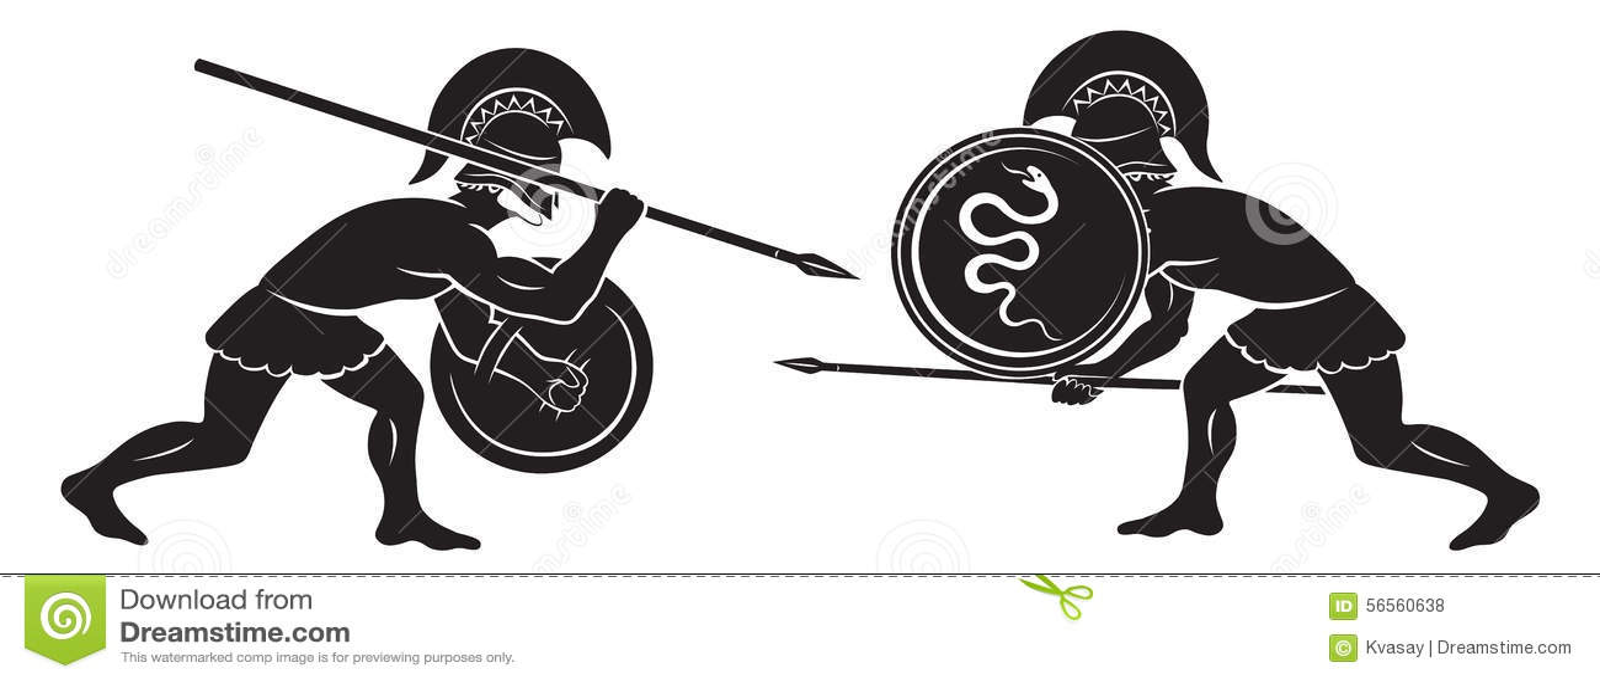 Download Μάχη gladiators στοκ εικόνες. εικόνα από δαχτυλίδι, μαίανδρος - 56560638